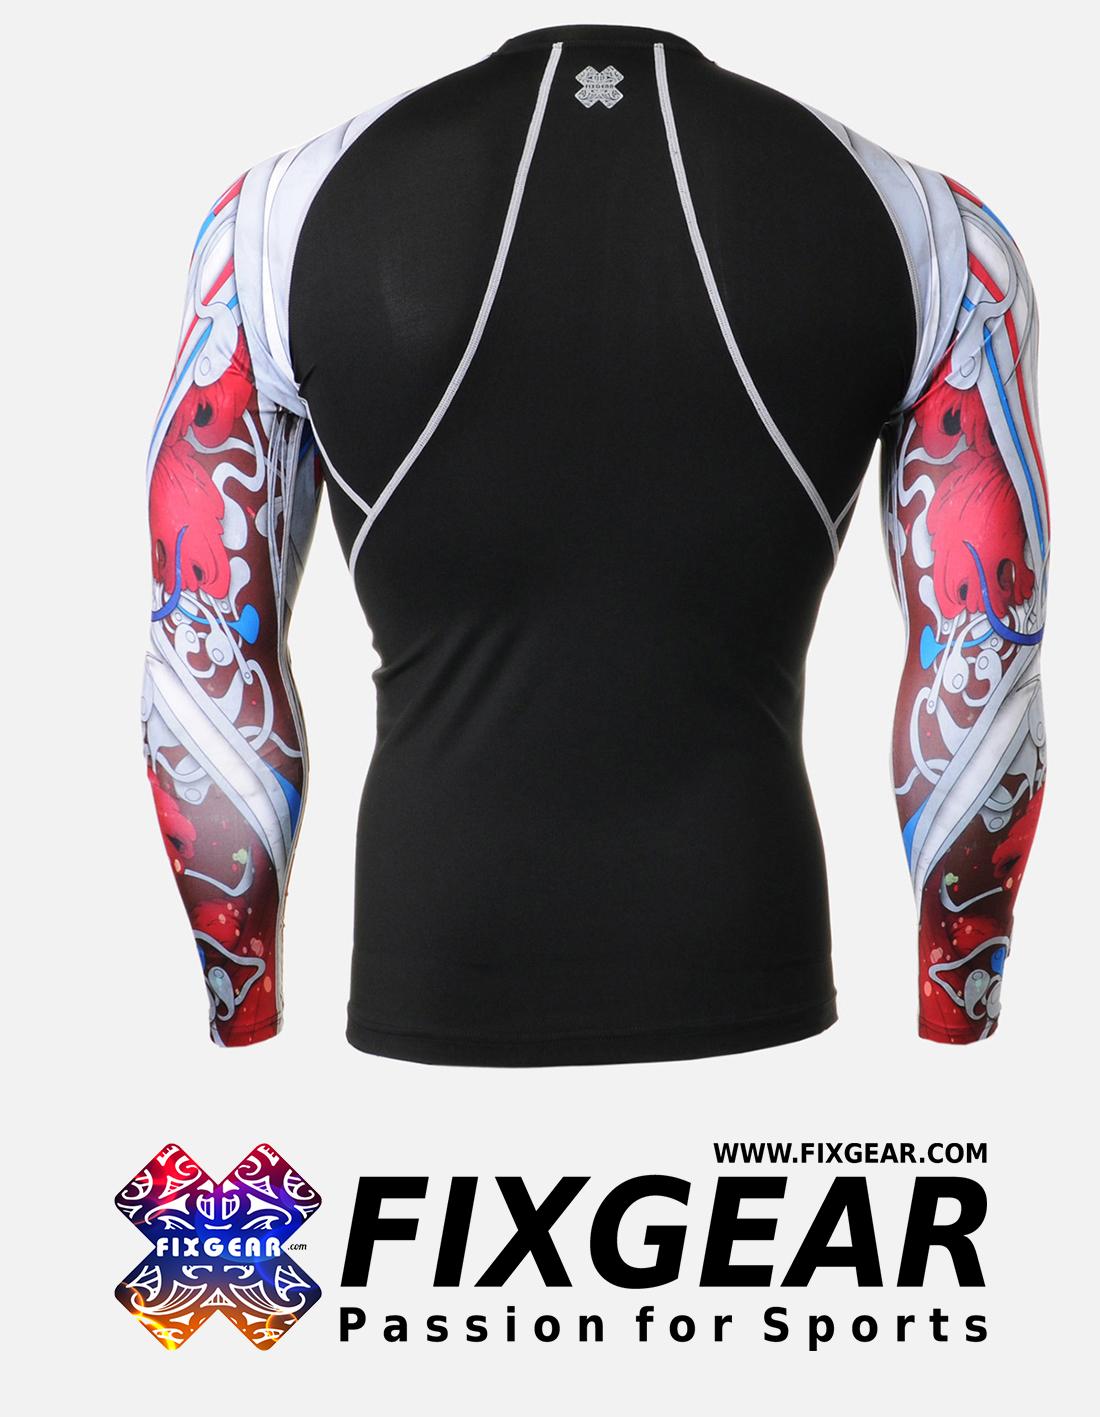 FIXGEAR CPD-B19R Compression Base Layer Shirt